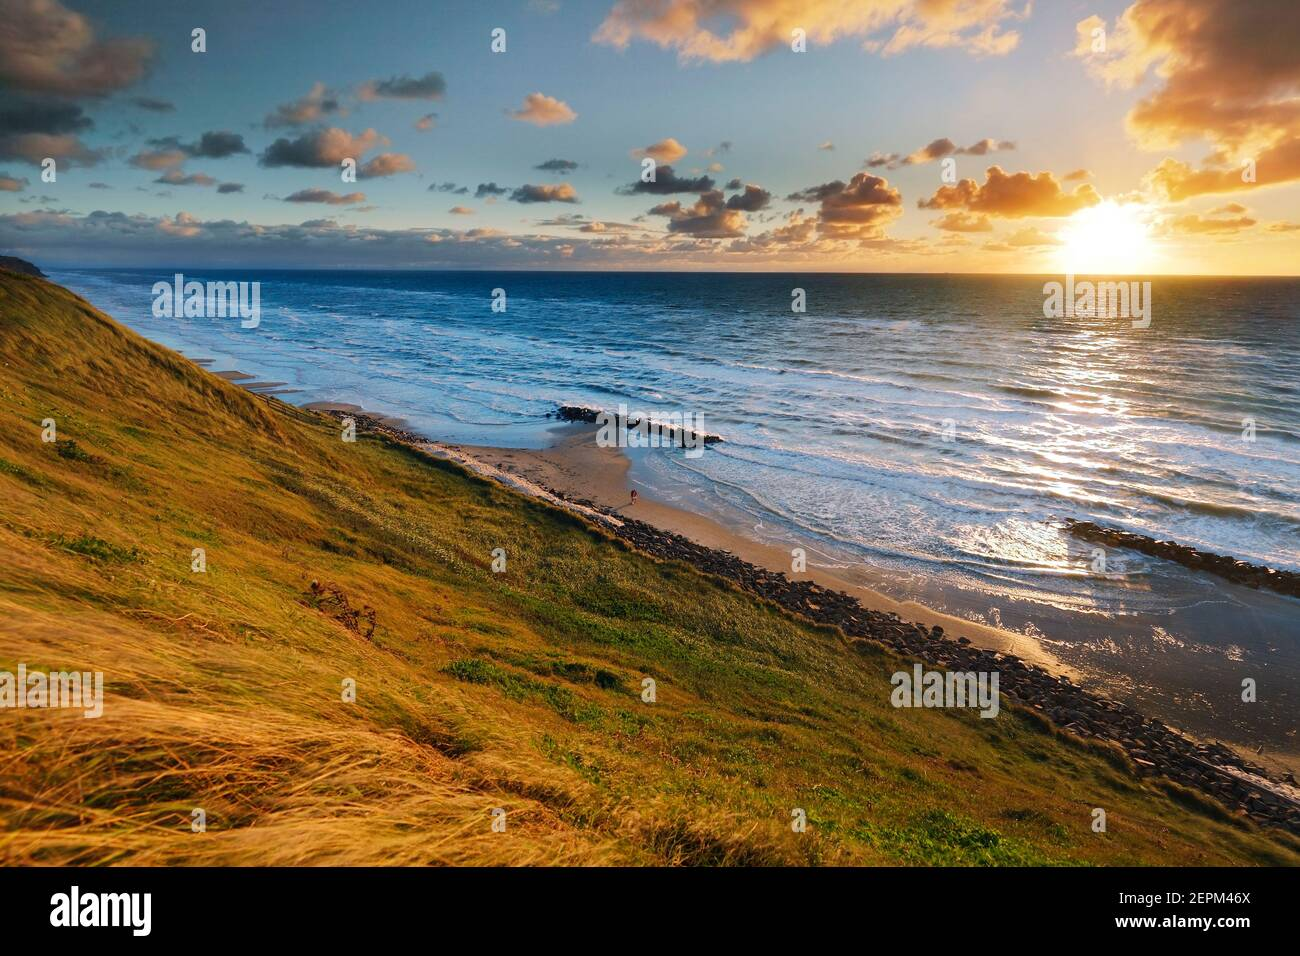 Puesta de sol en la costa de Lønstrup, Danmark; Lonstrup, Dinamarca Foto de stock